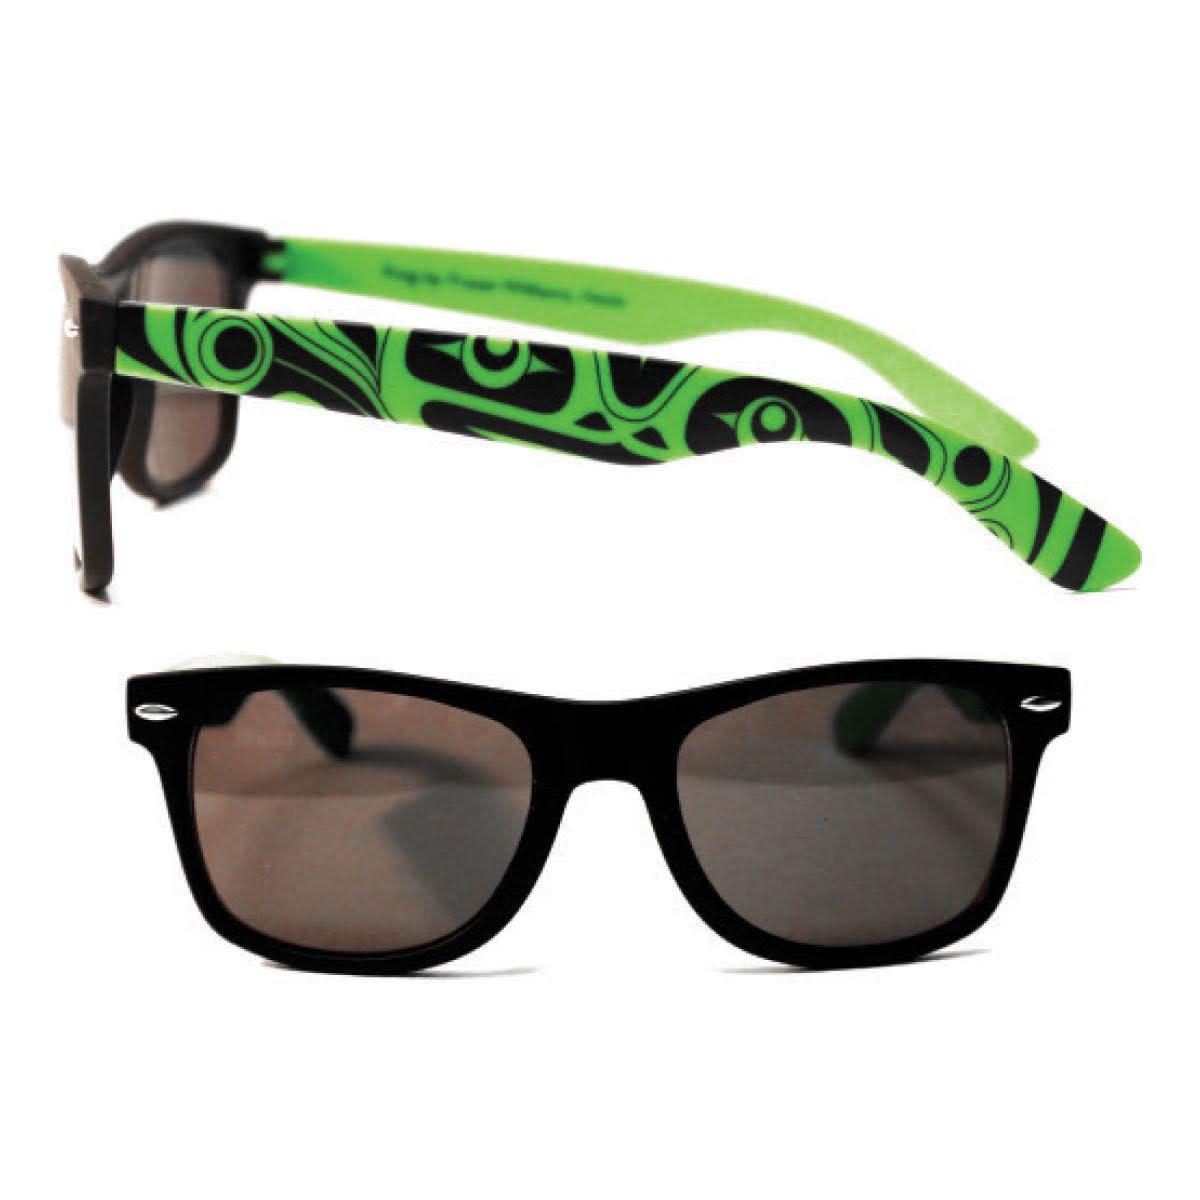 SunGlasses - Adult-11